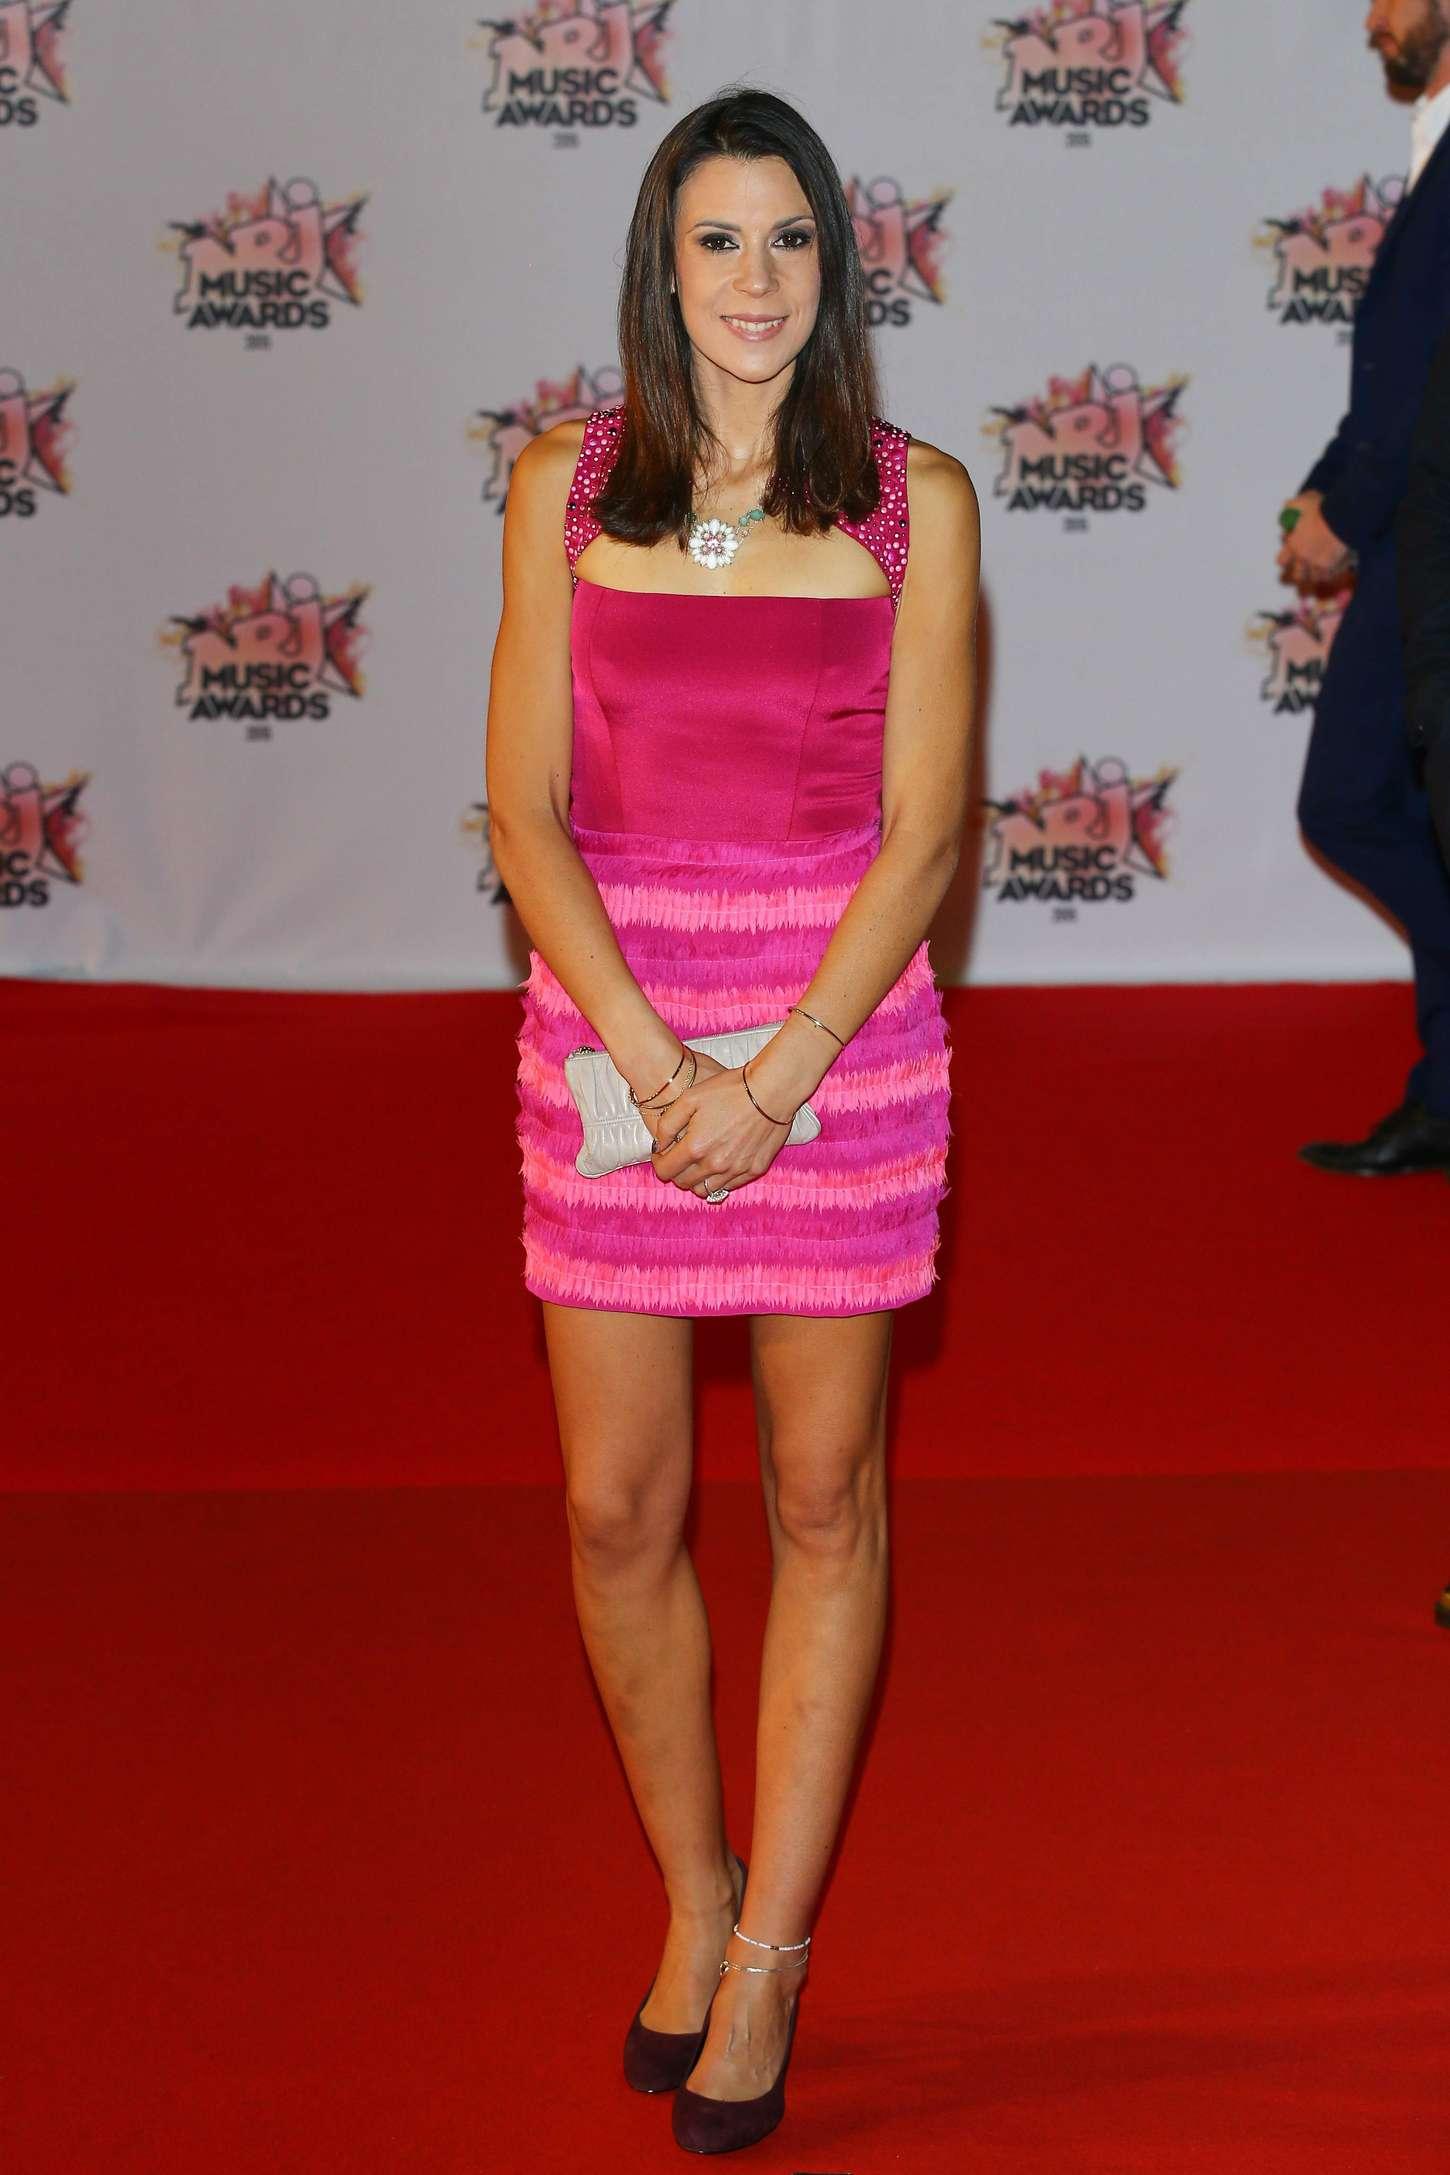 Marion Bartoli NRJ Music Awards in Cannes